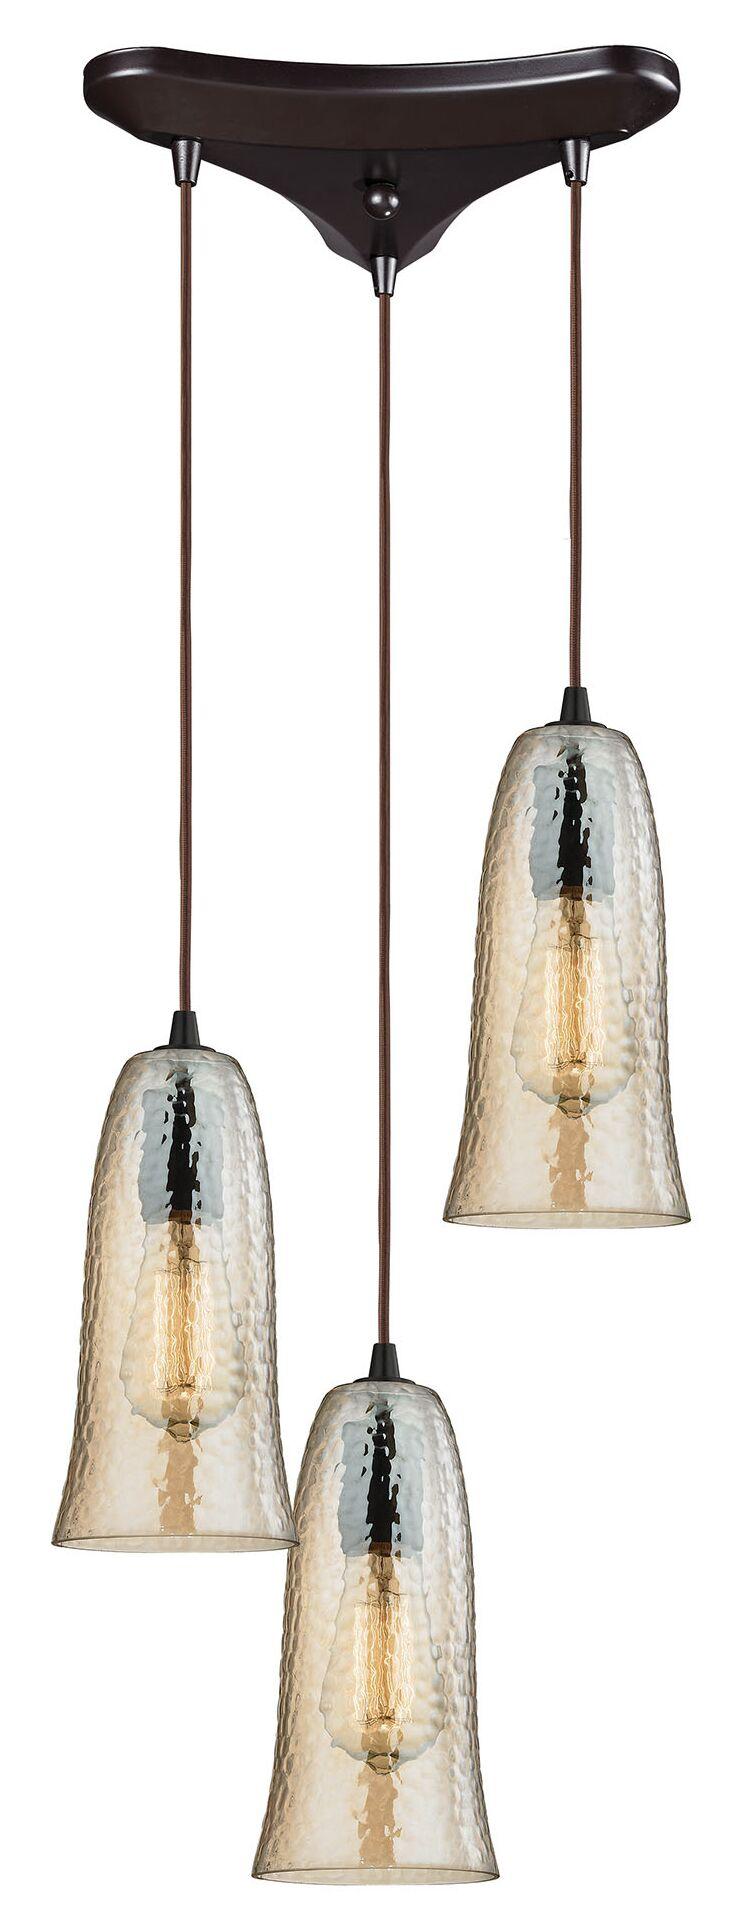 Esteban 3-Light Glass Cascade Pendant Finish: Satin Nickel, Shade Color: Aqua